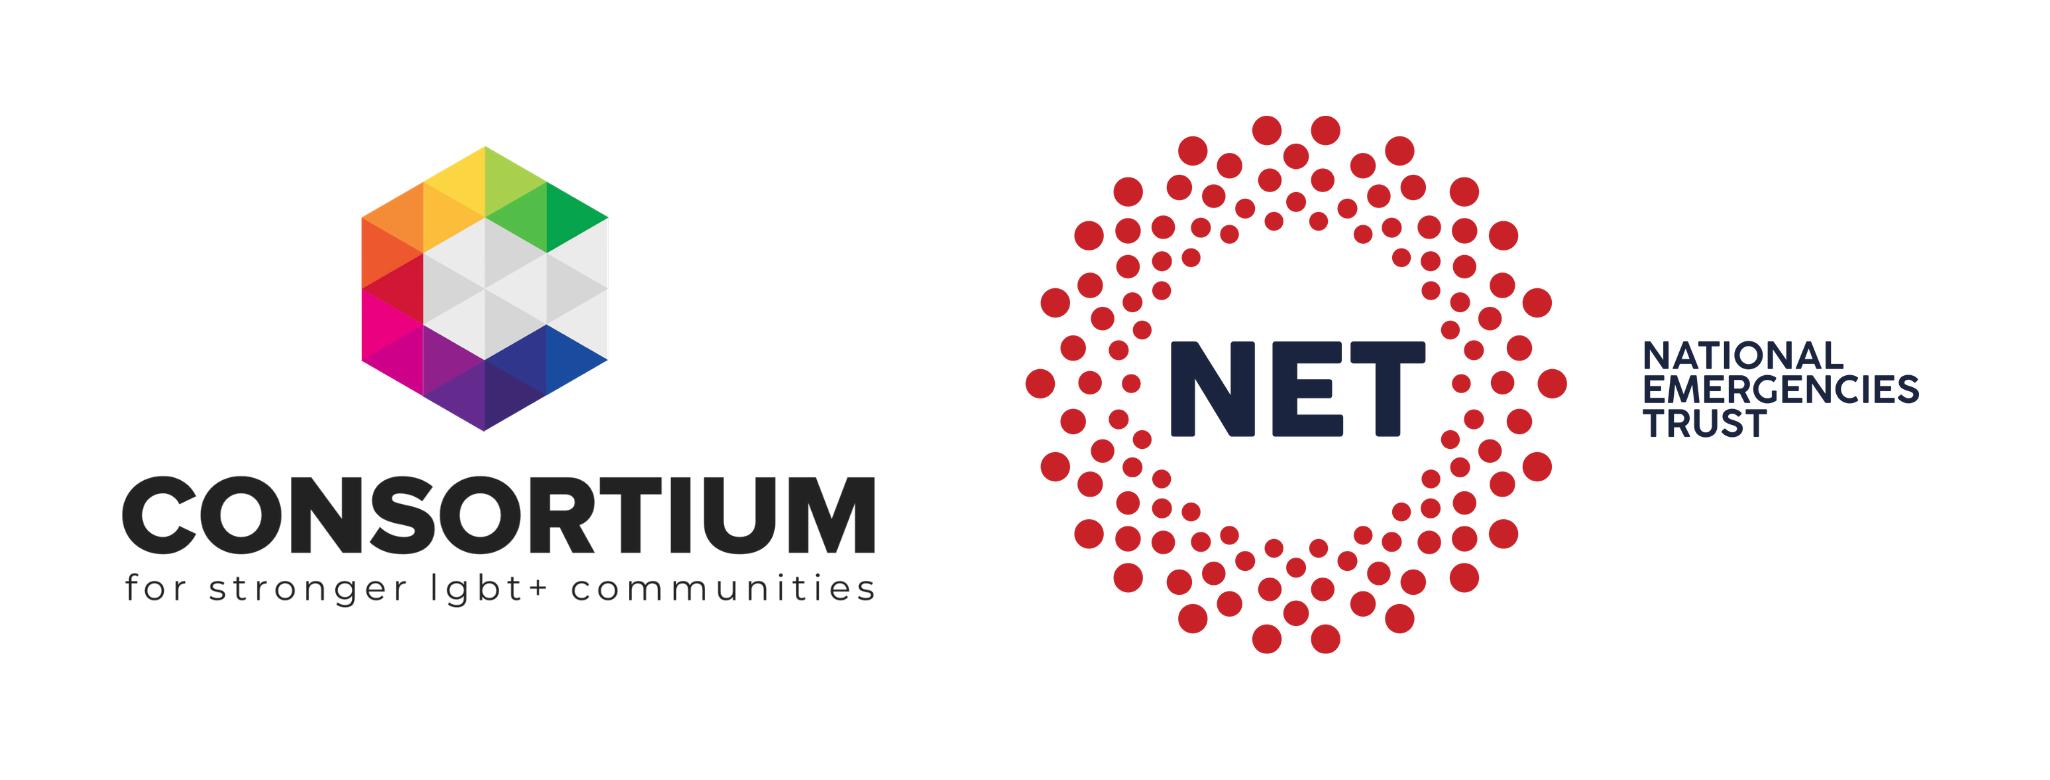 Consortium logo and National Emergencies Trust logo.